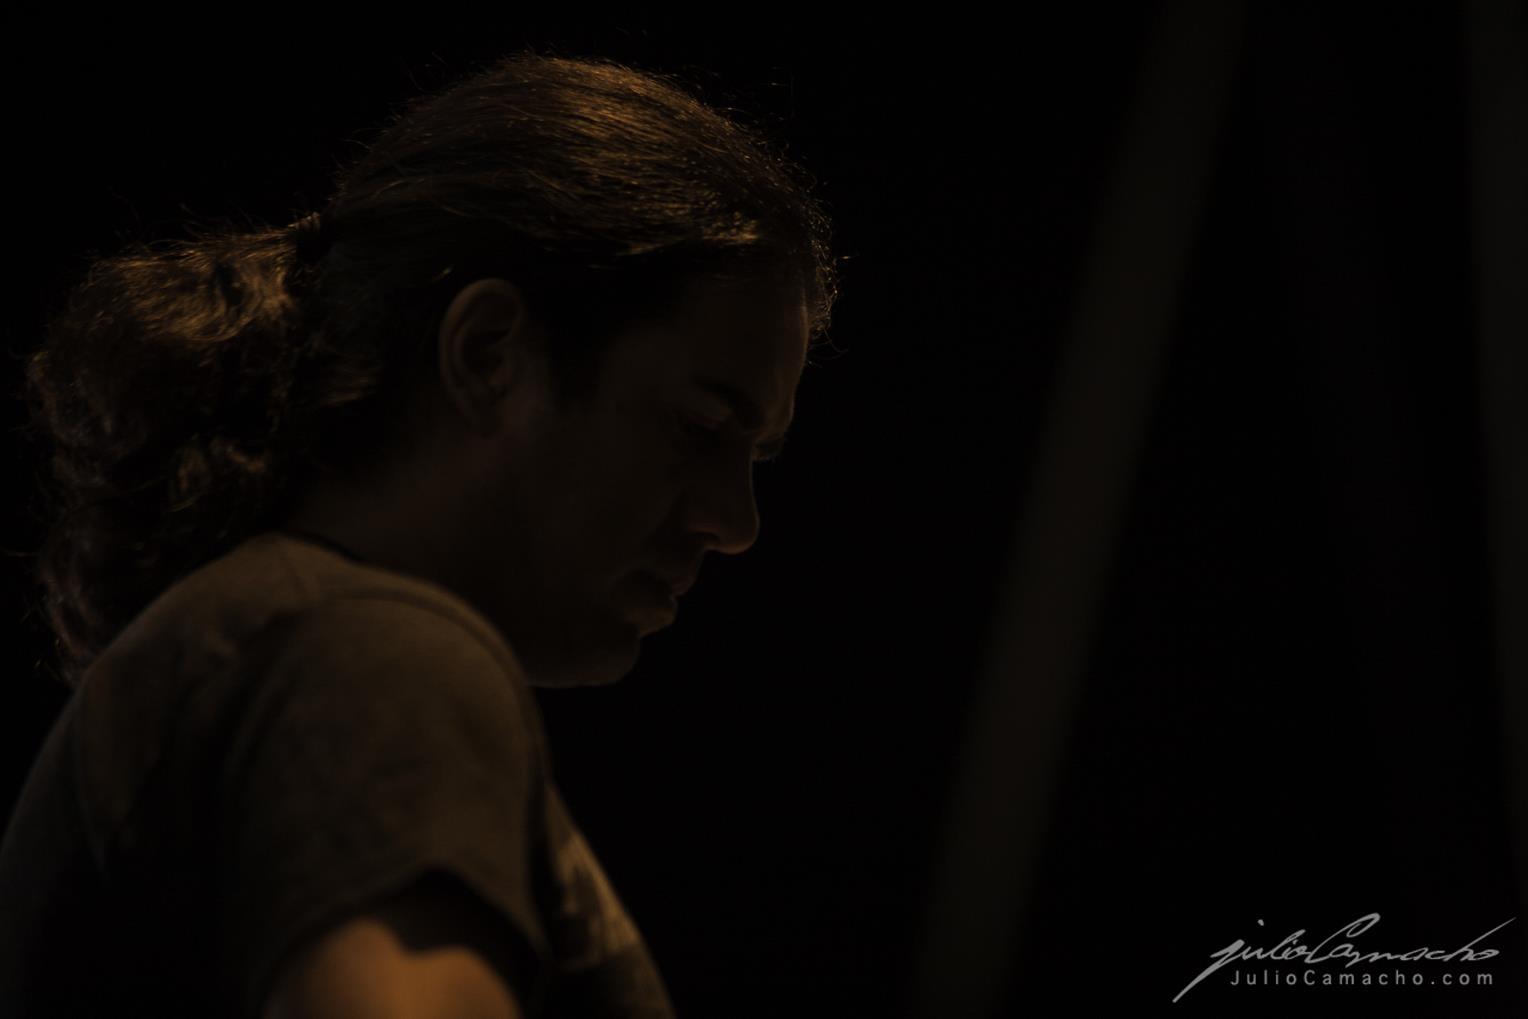 2014-10-30 31 CAST TOUR Ensenada y Tijuana - 1376 - www.Juli (Copy).jpg